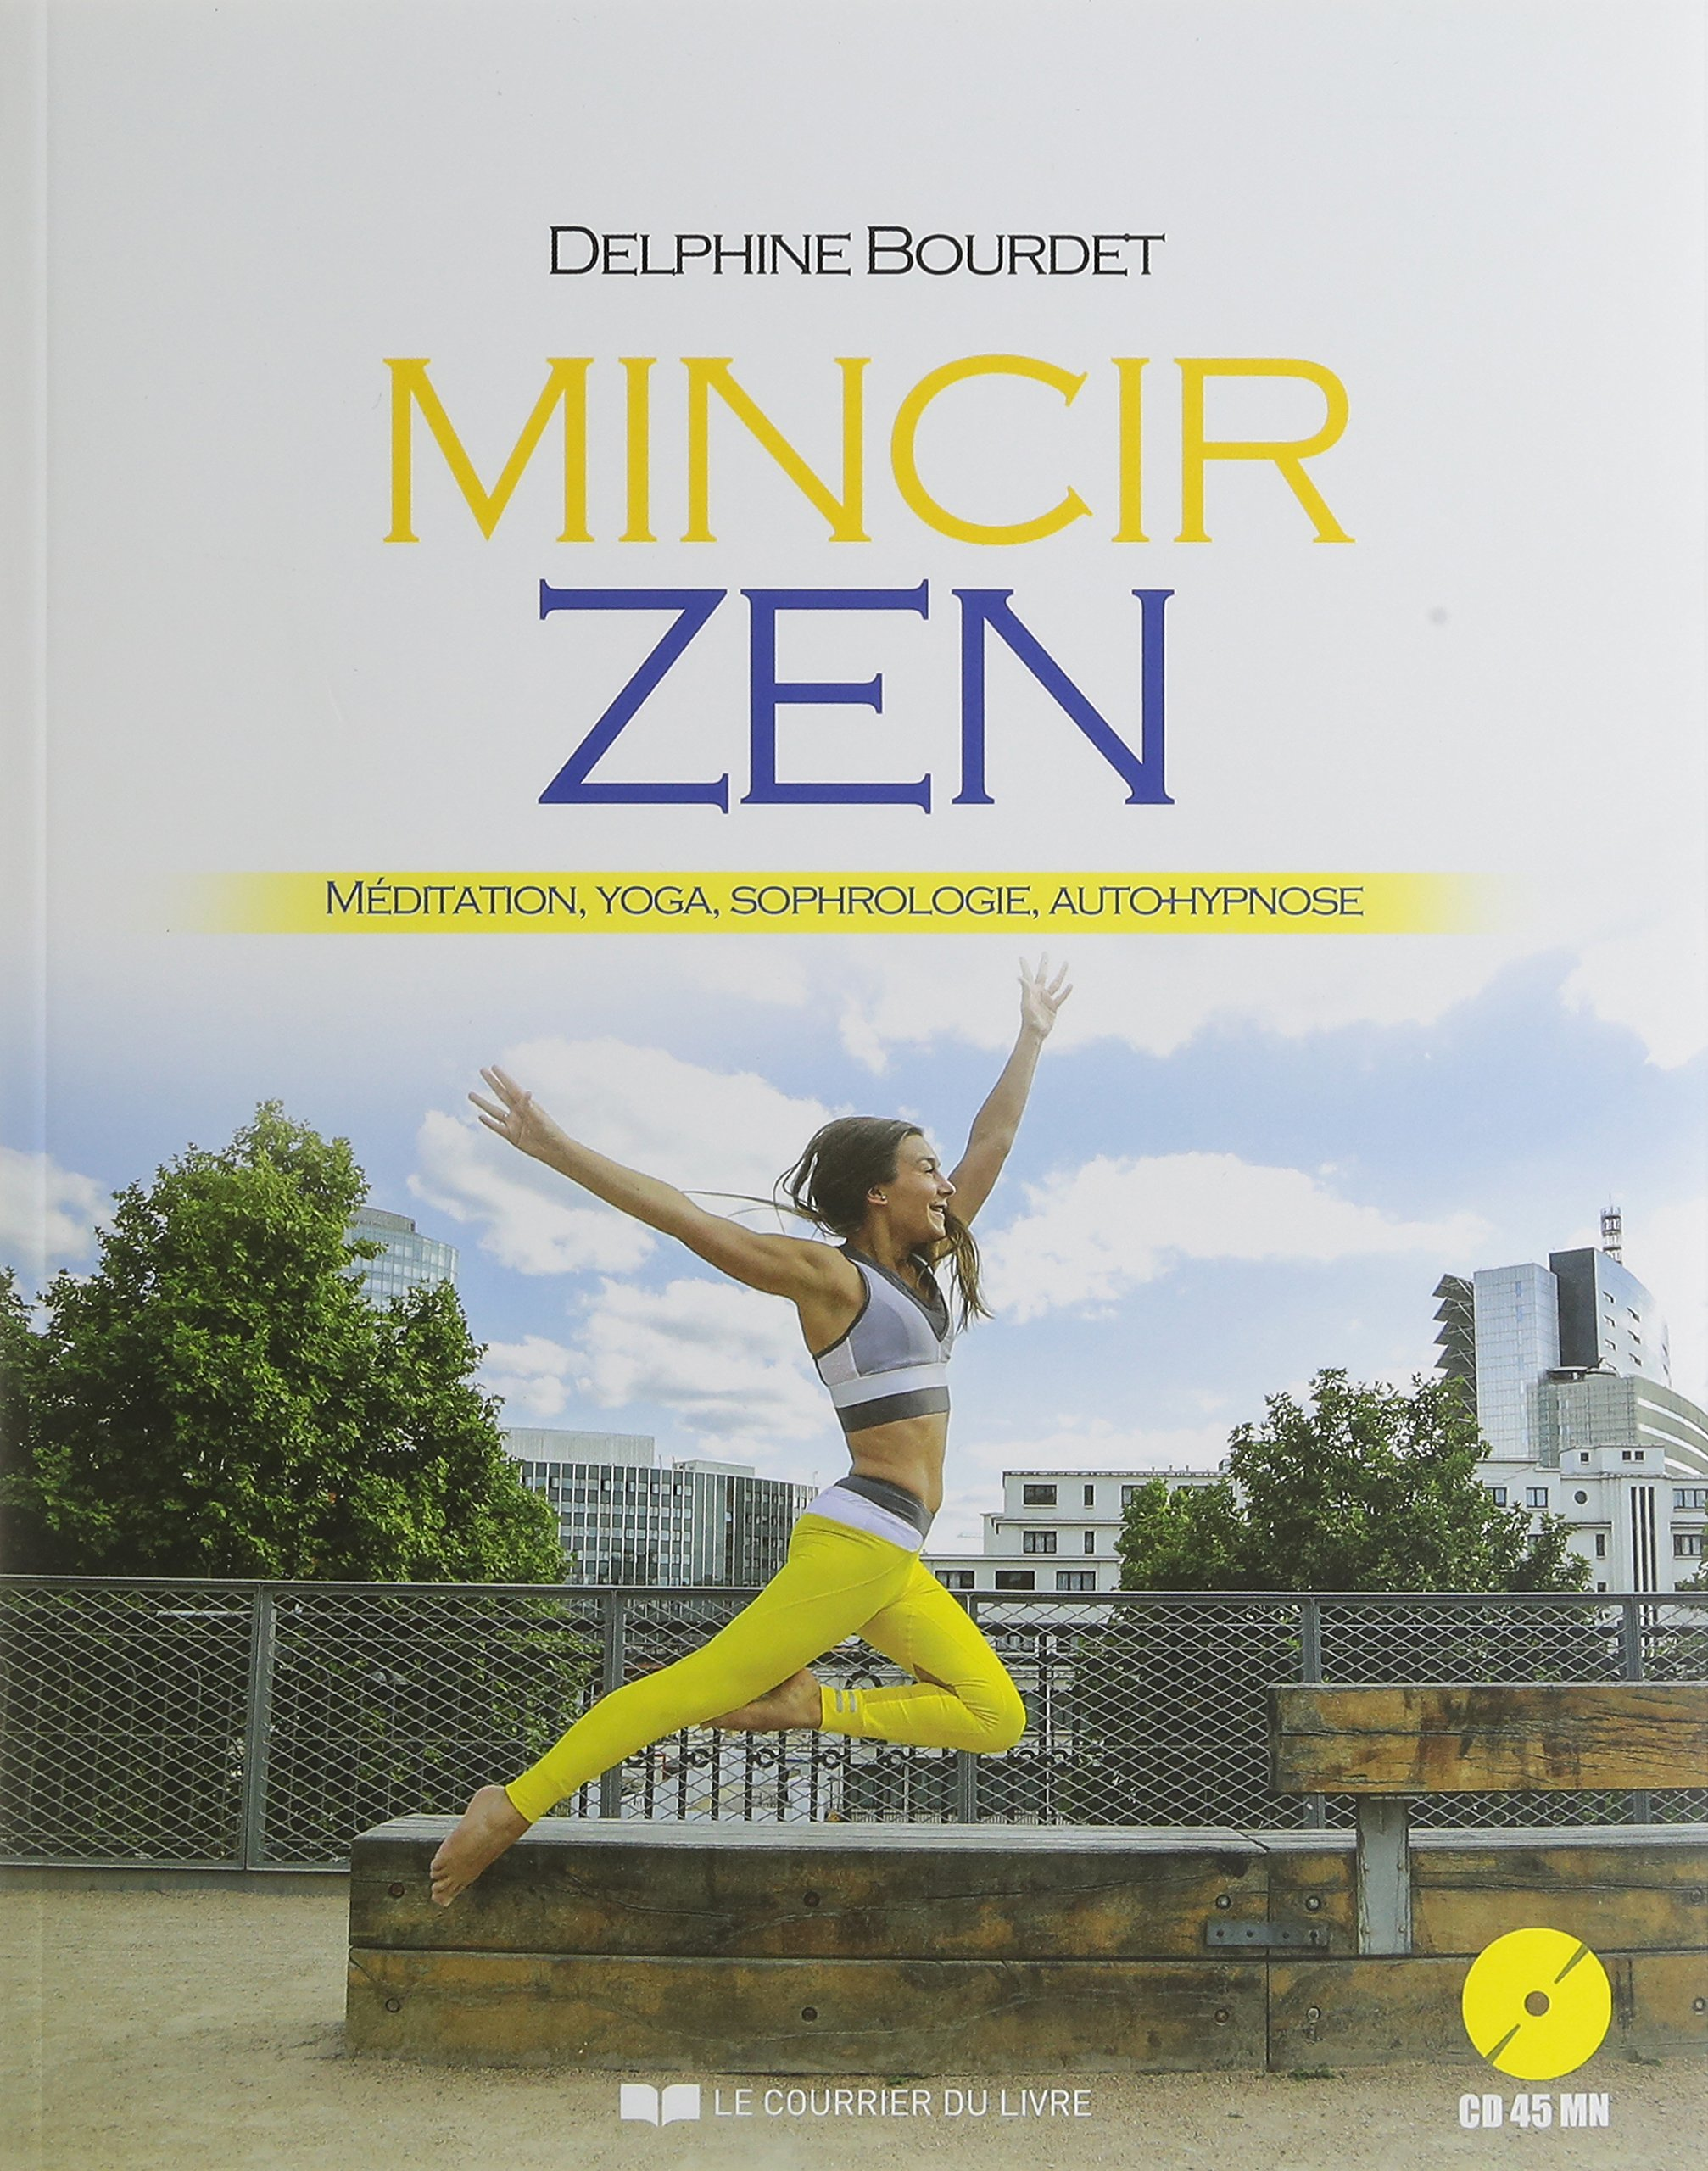 Mincir Zen Meditation Yoga Sophrologie Auto Hypnose